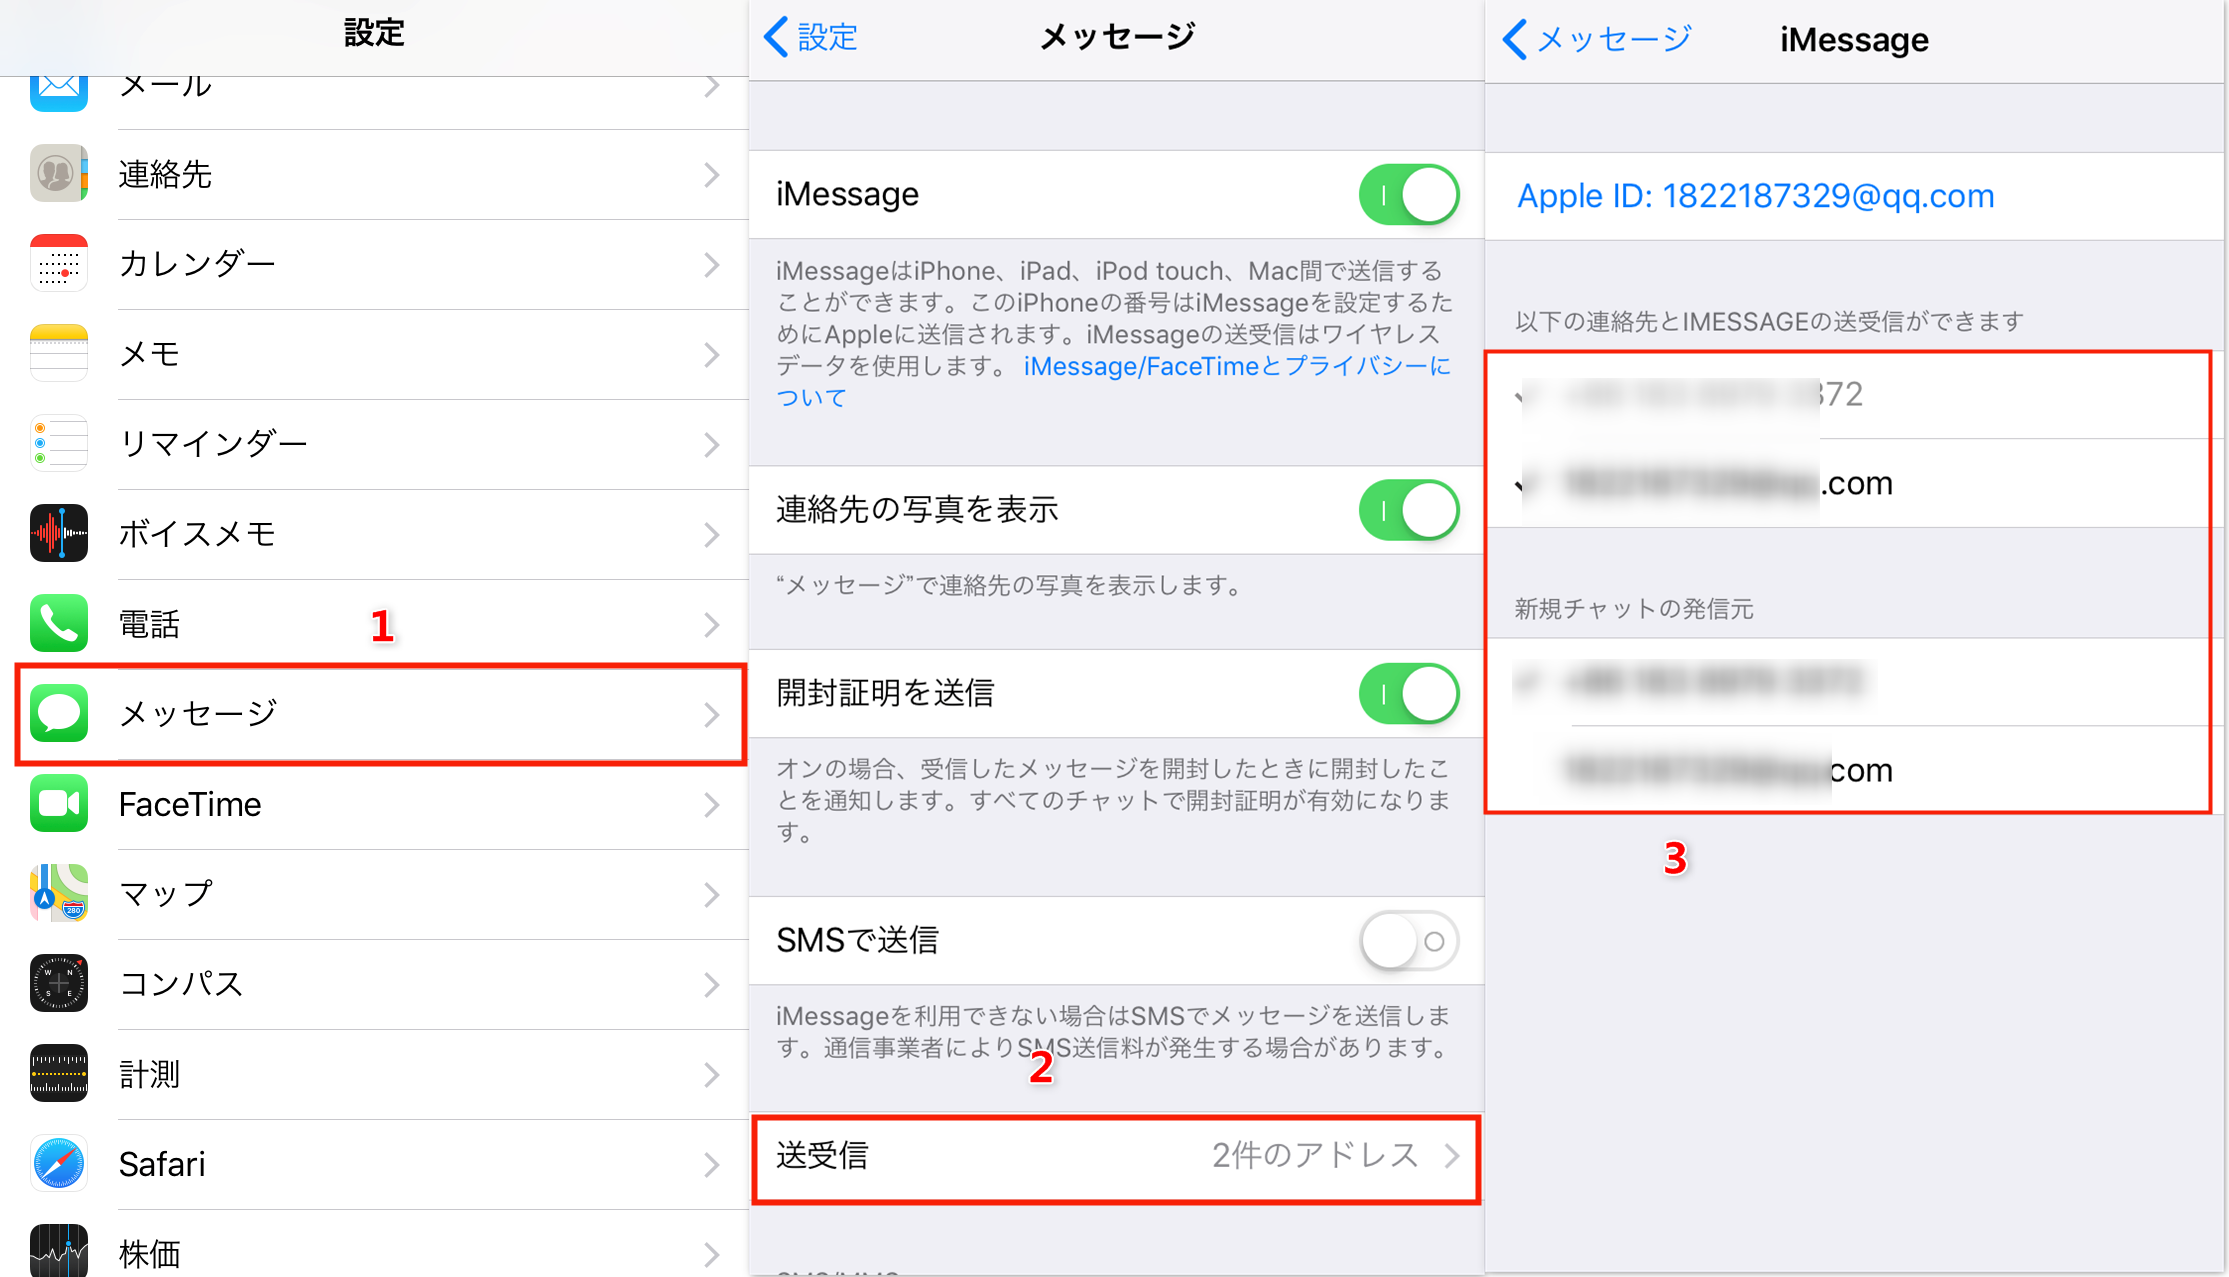 iPhone 8で自分のメールアドレスの見方